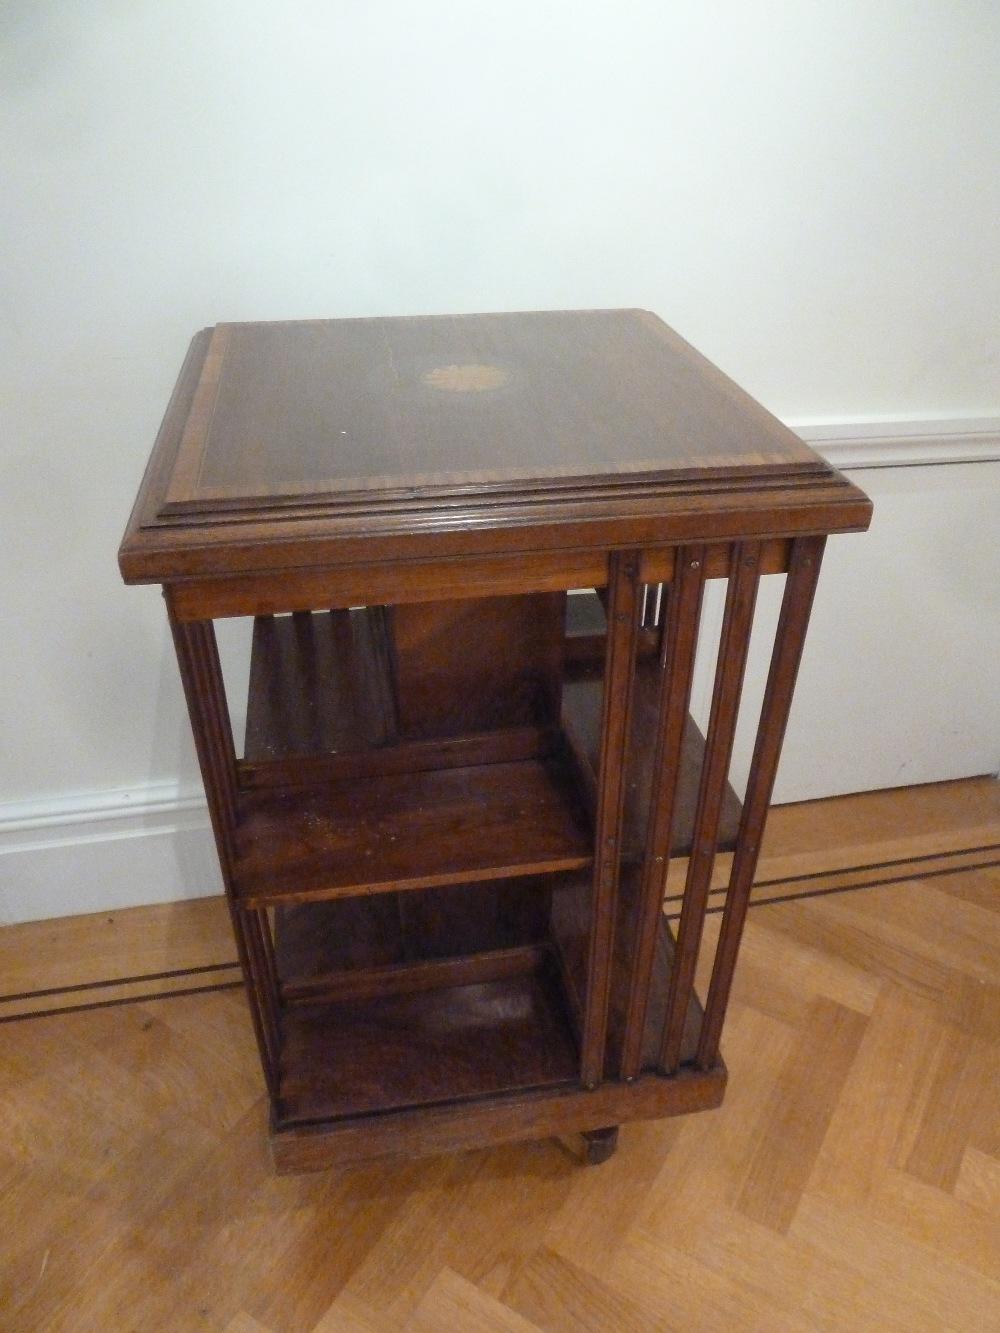 Lot 23 - An Edwardian mahogany inlaid revolving rectangular book stand